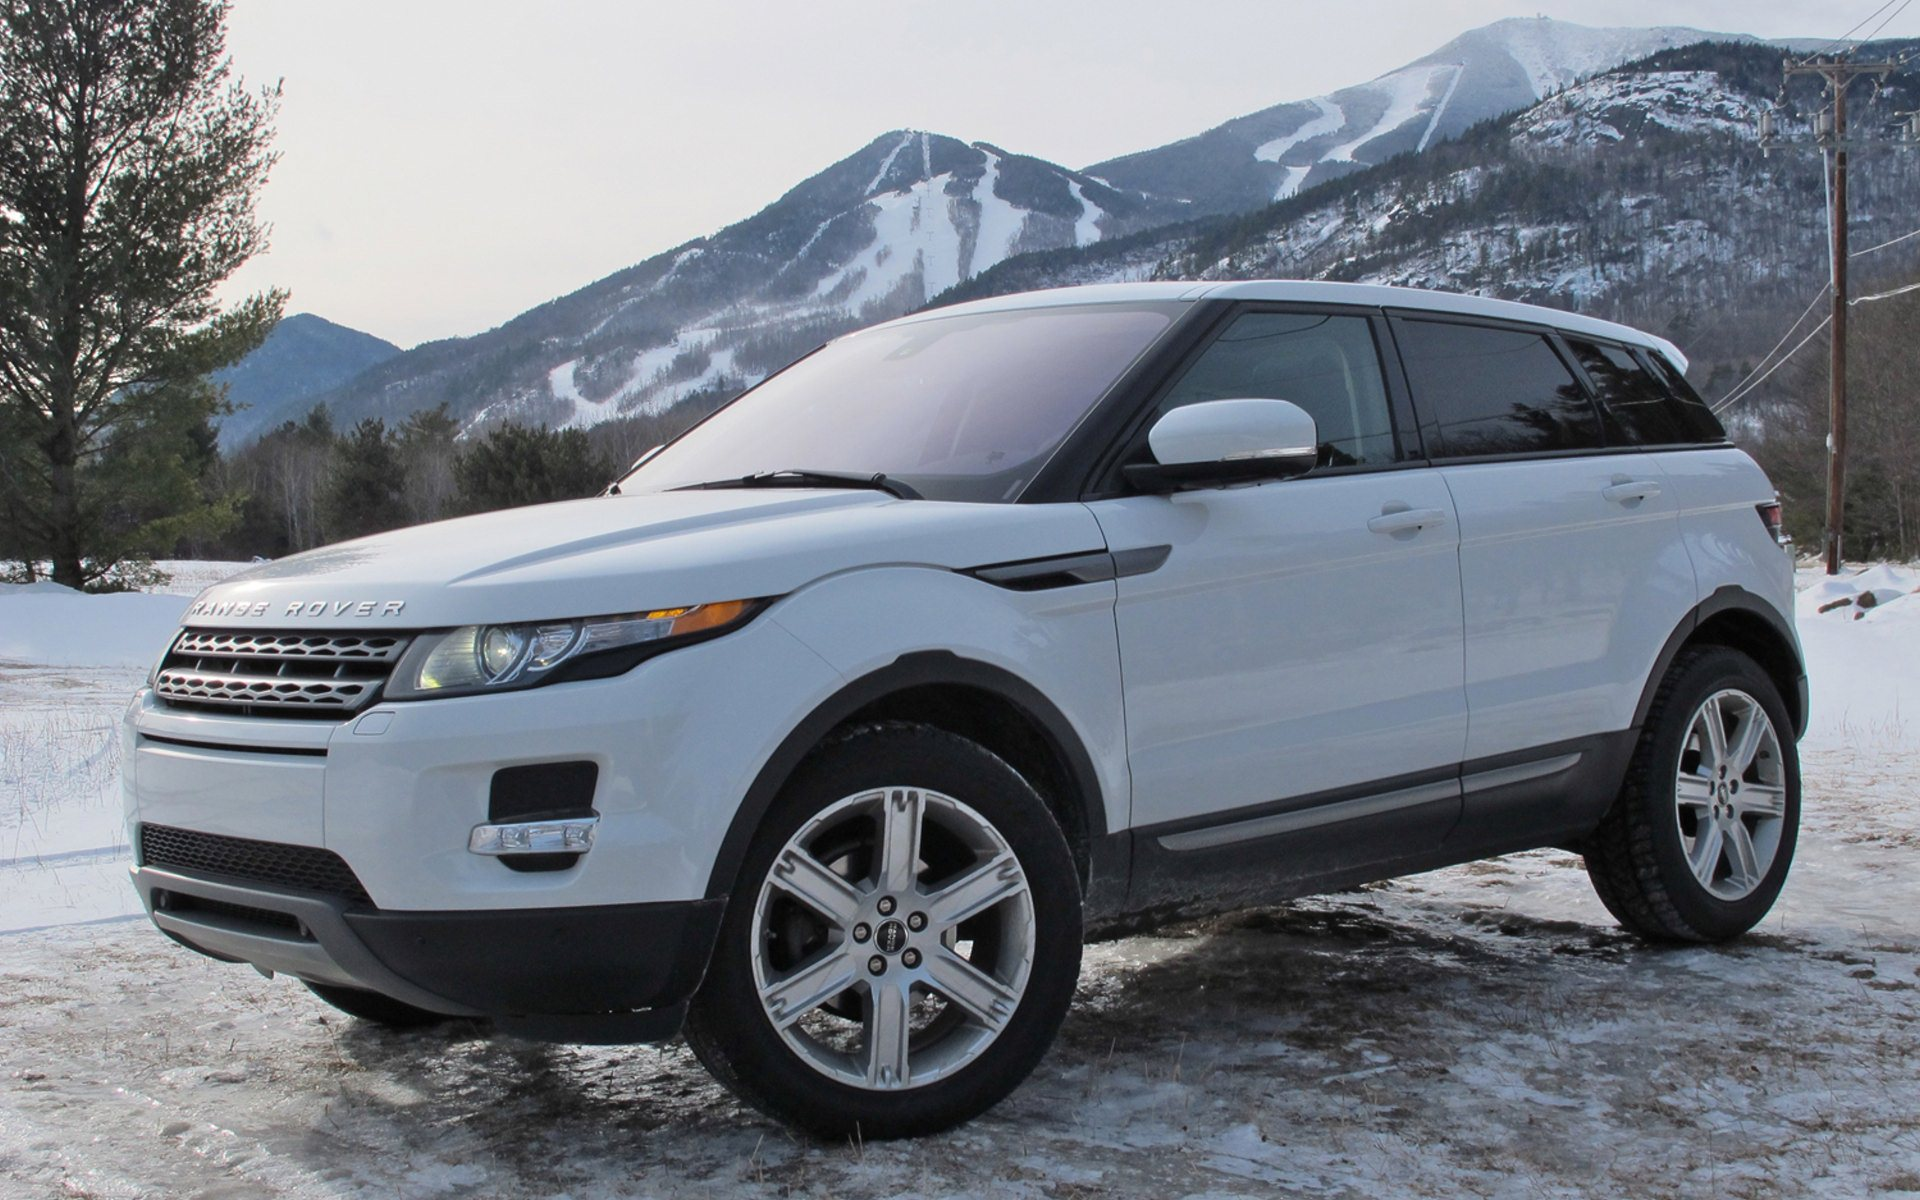 white range rover evoque wallpaper. Black Bedroom Furniture Sets. Home Design Ideas